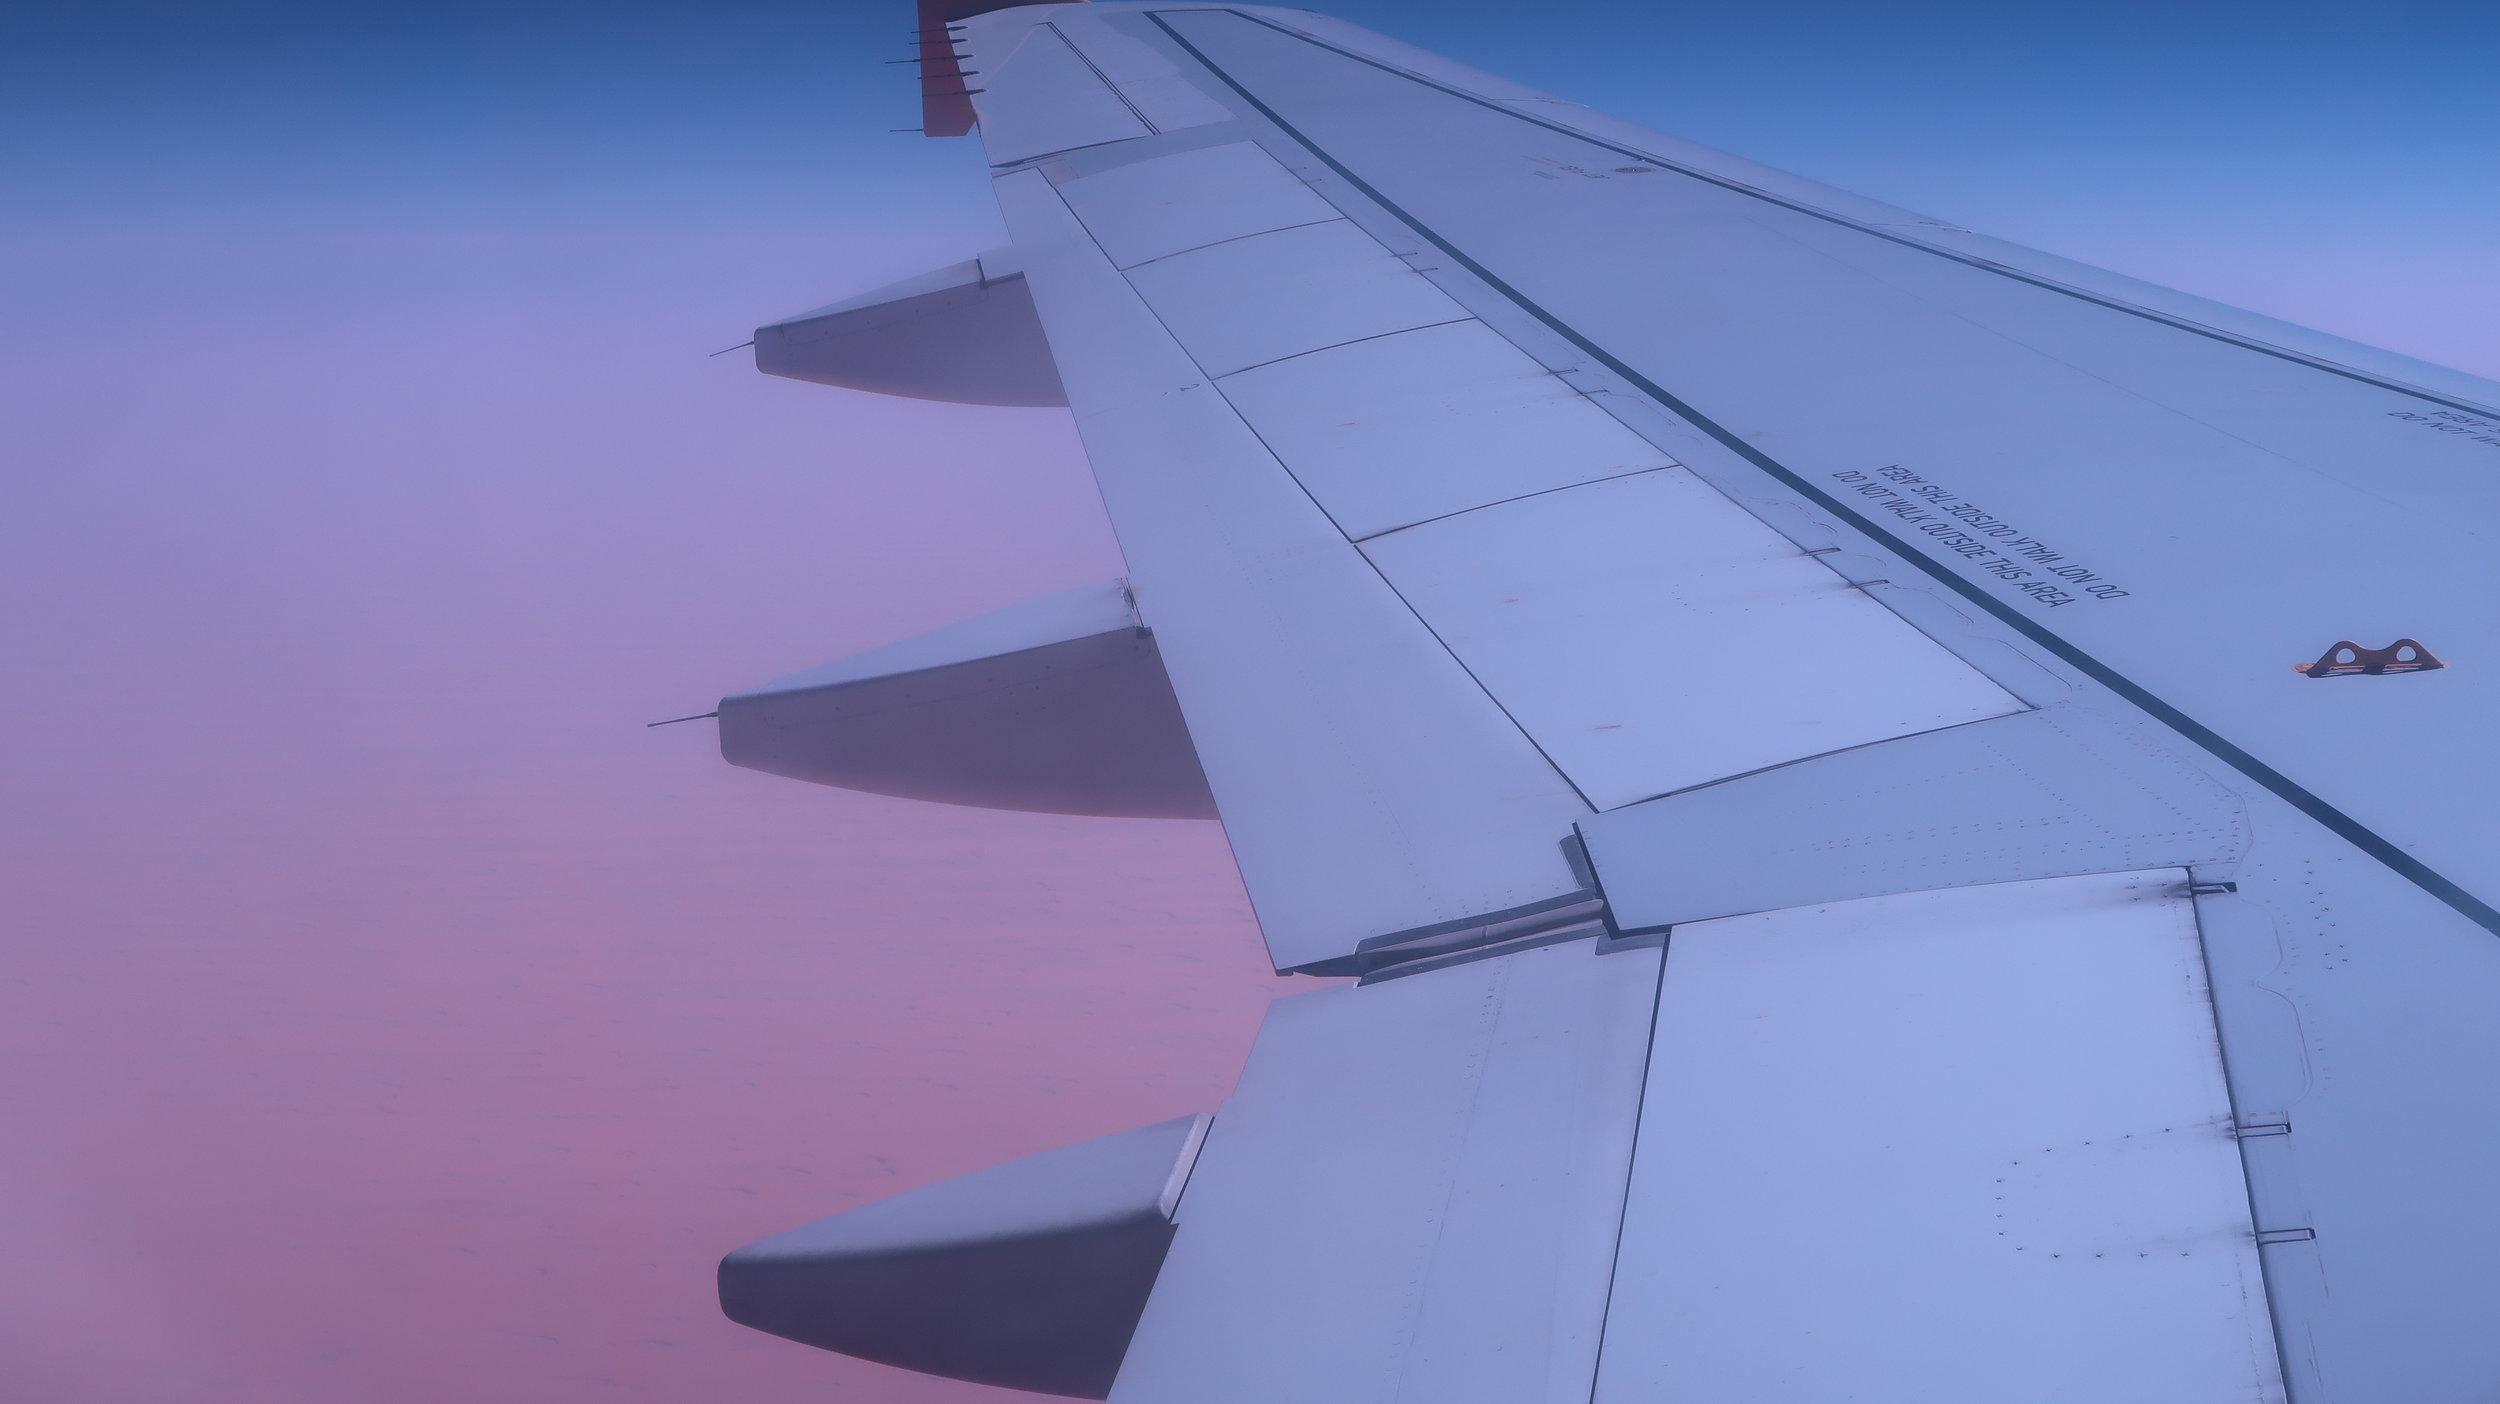 Etihad-flight-to-Amman-mingmingfeng-01.JPG